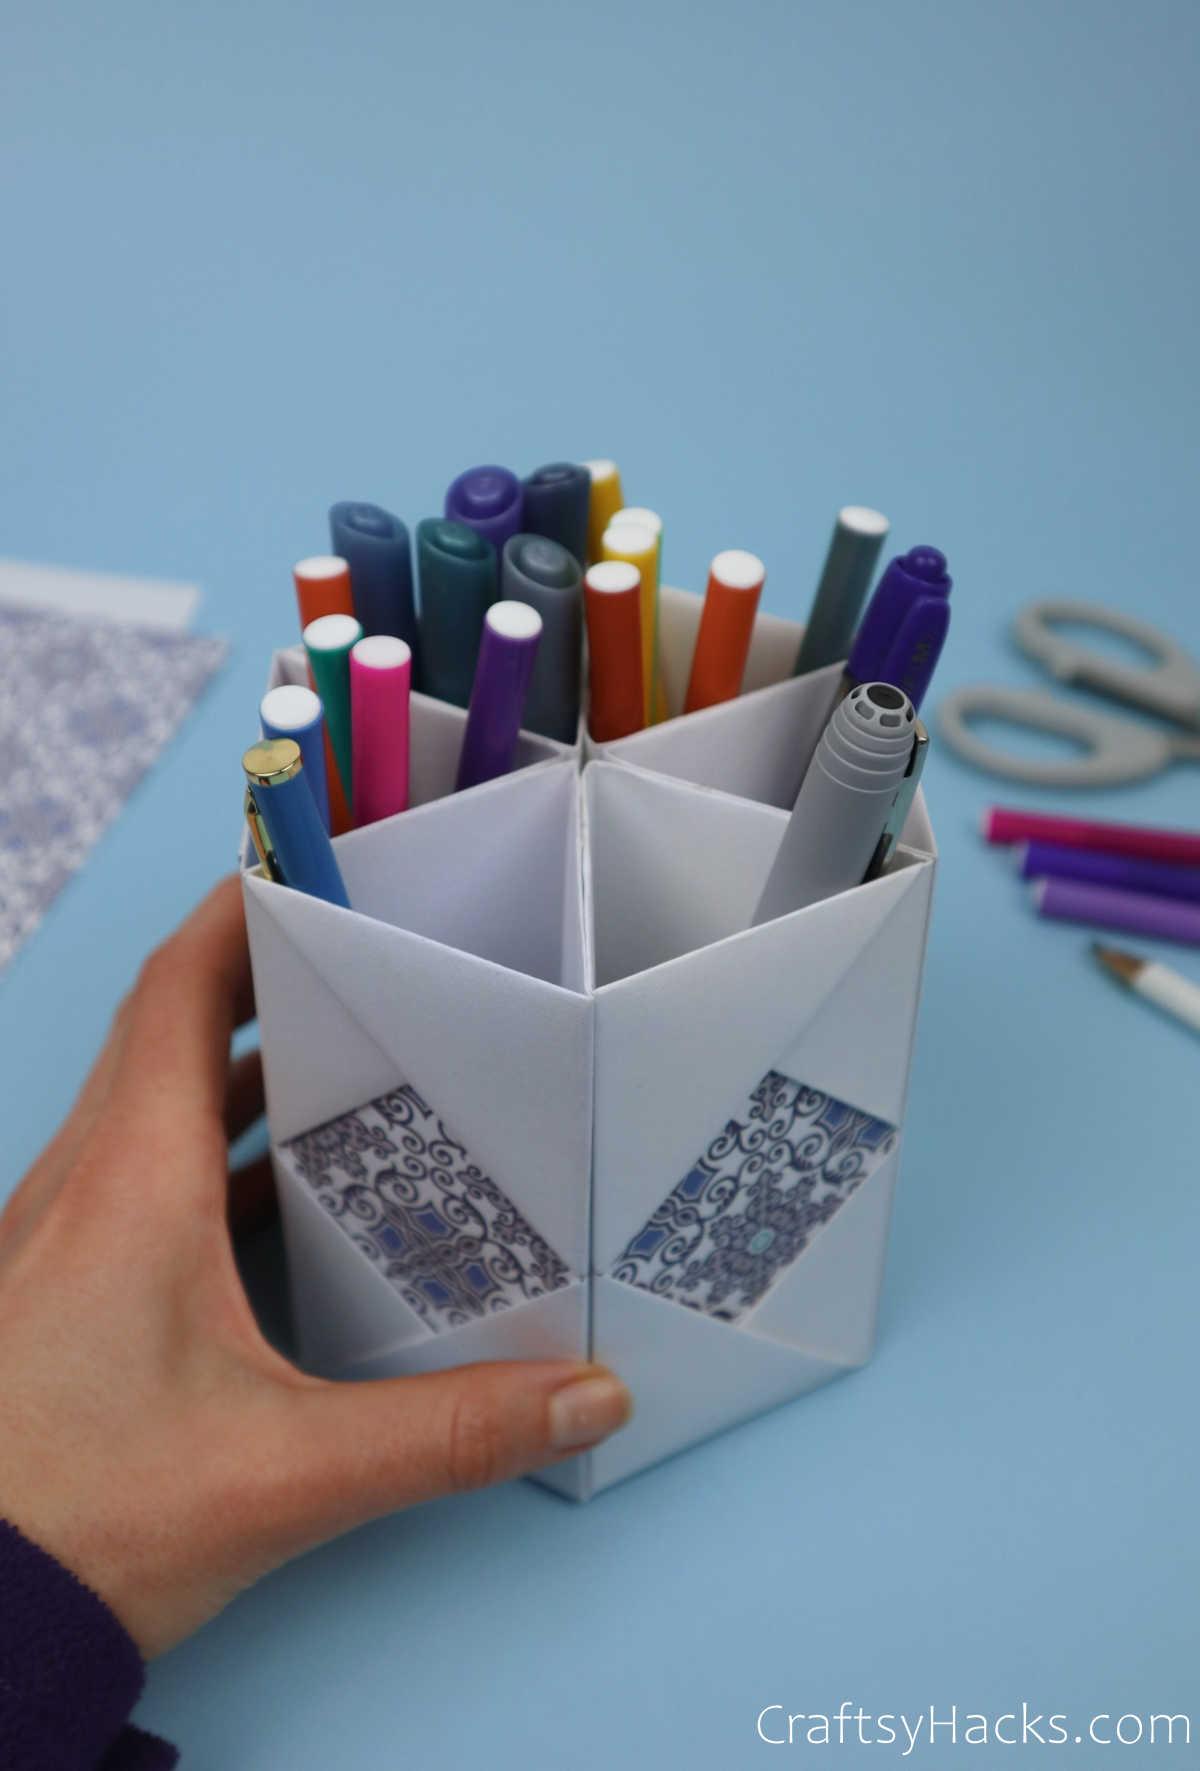 diy organizer with pens